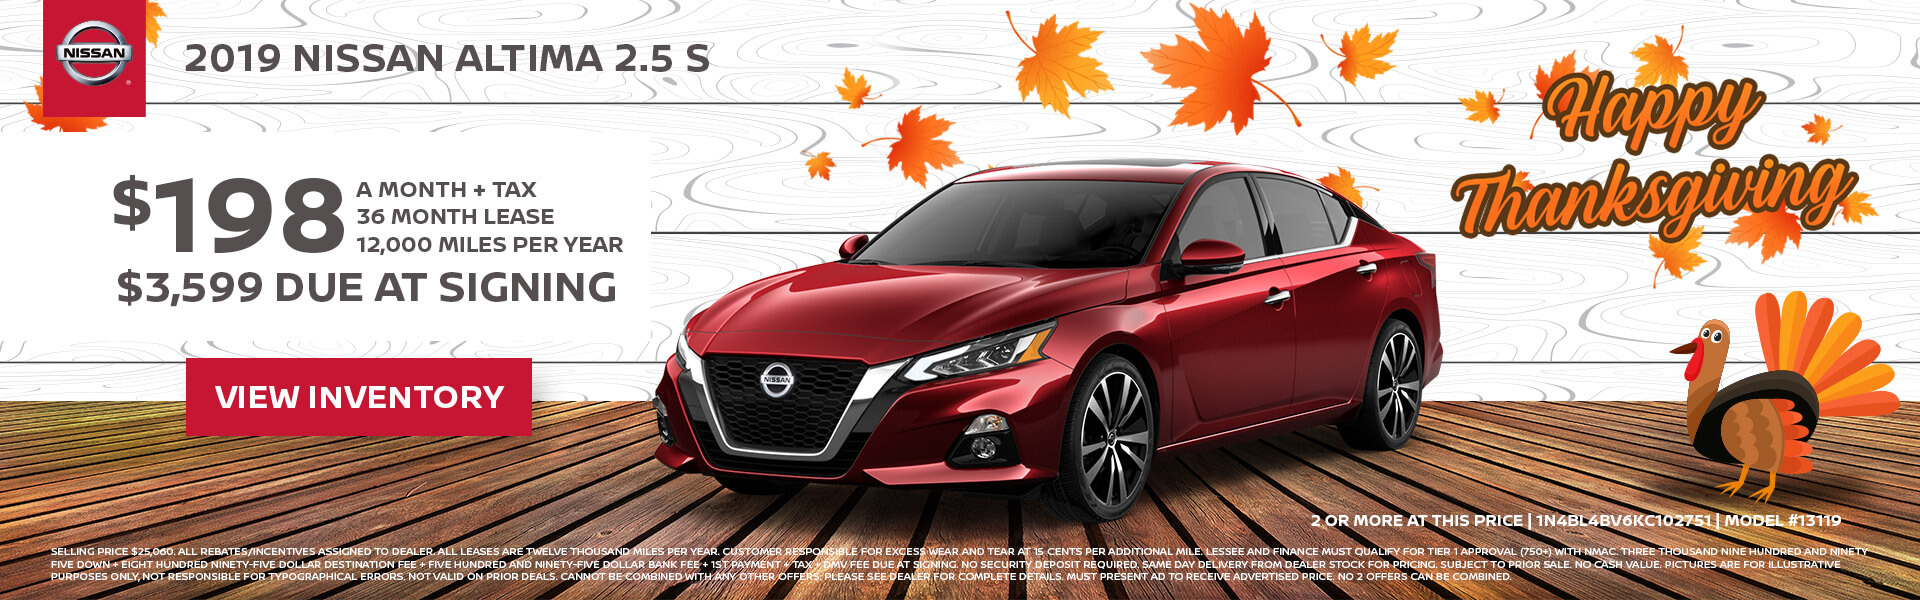 Nissan Altima $198 Lease